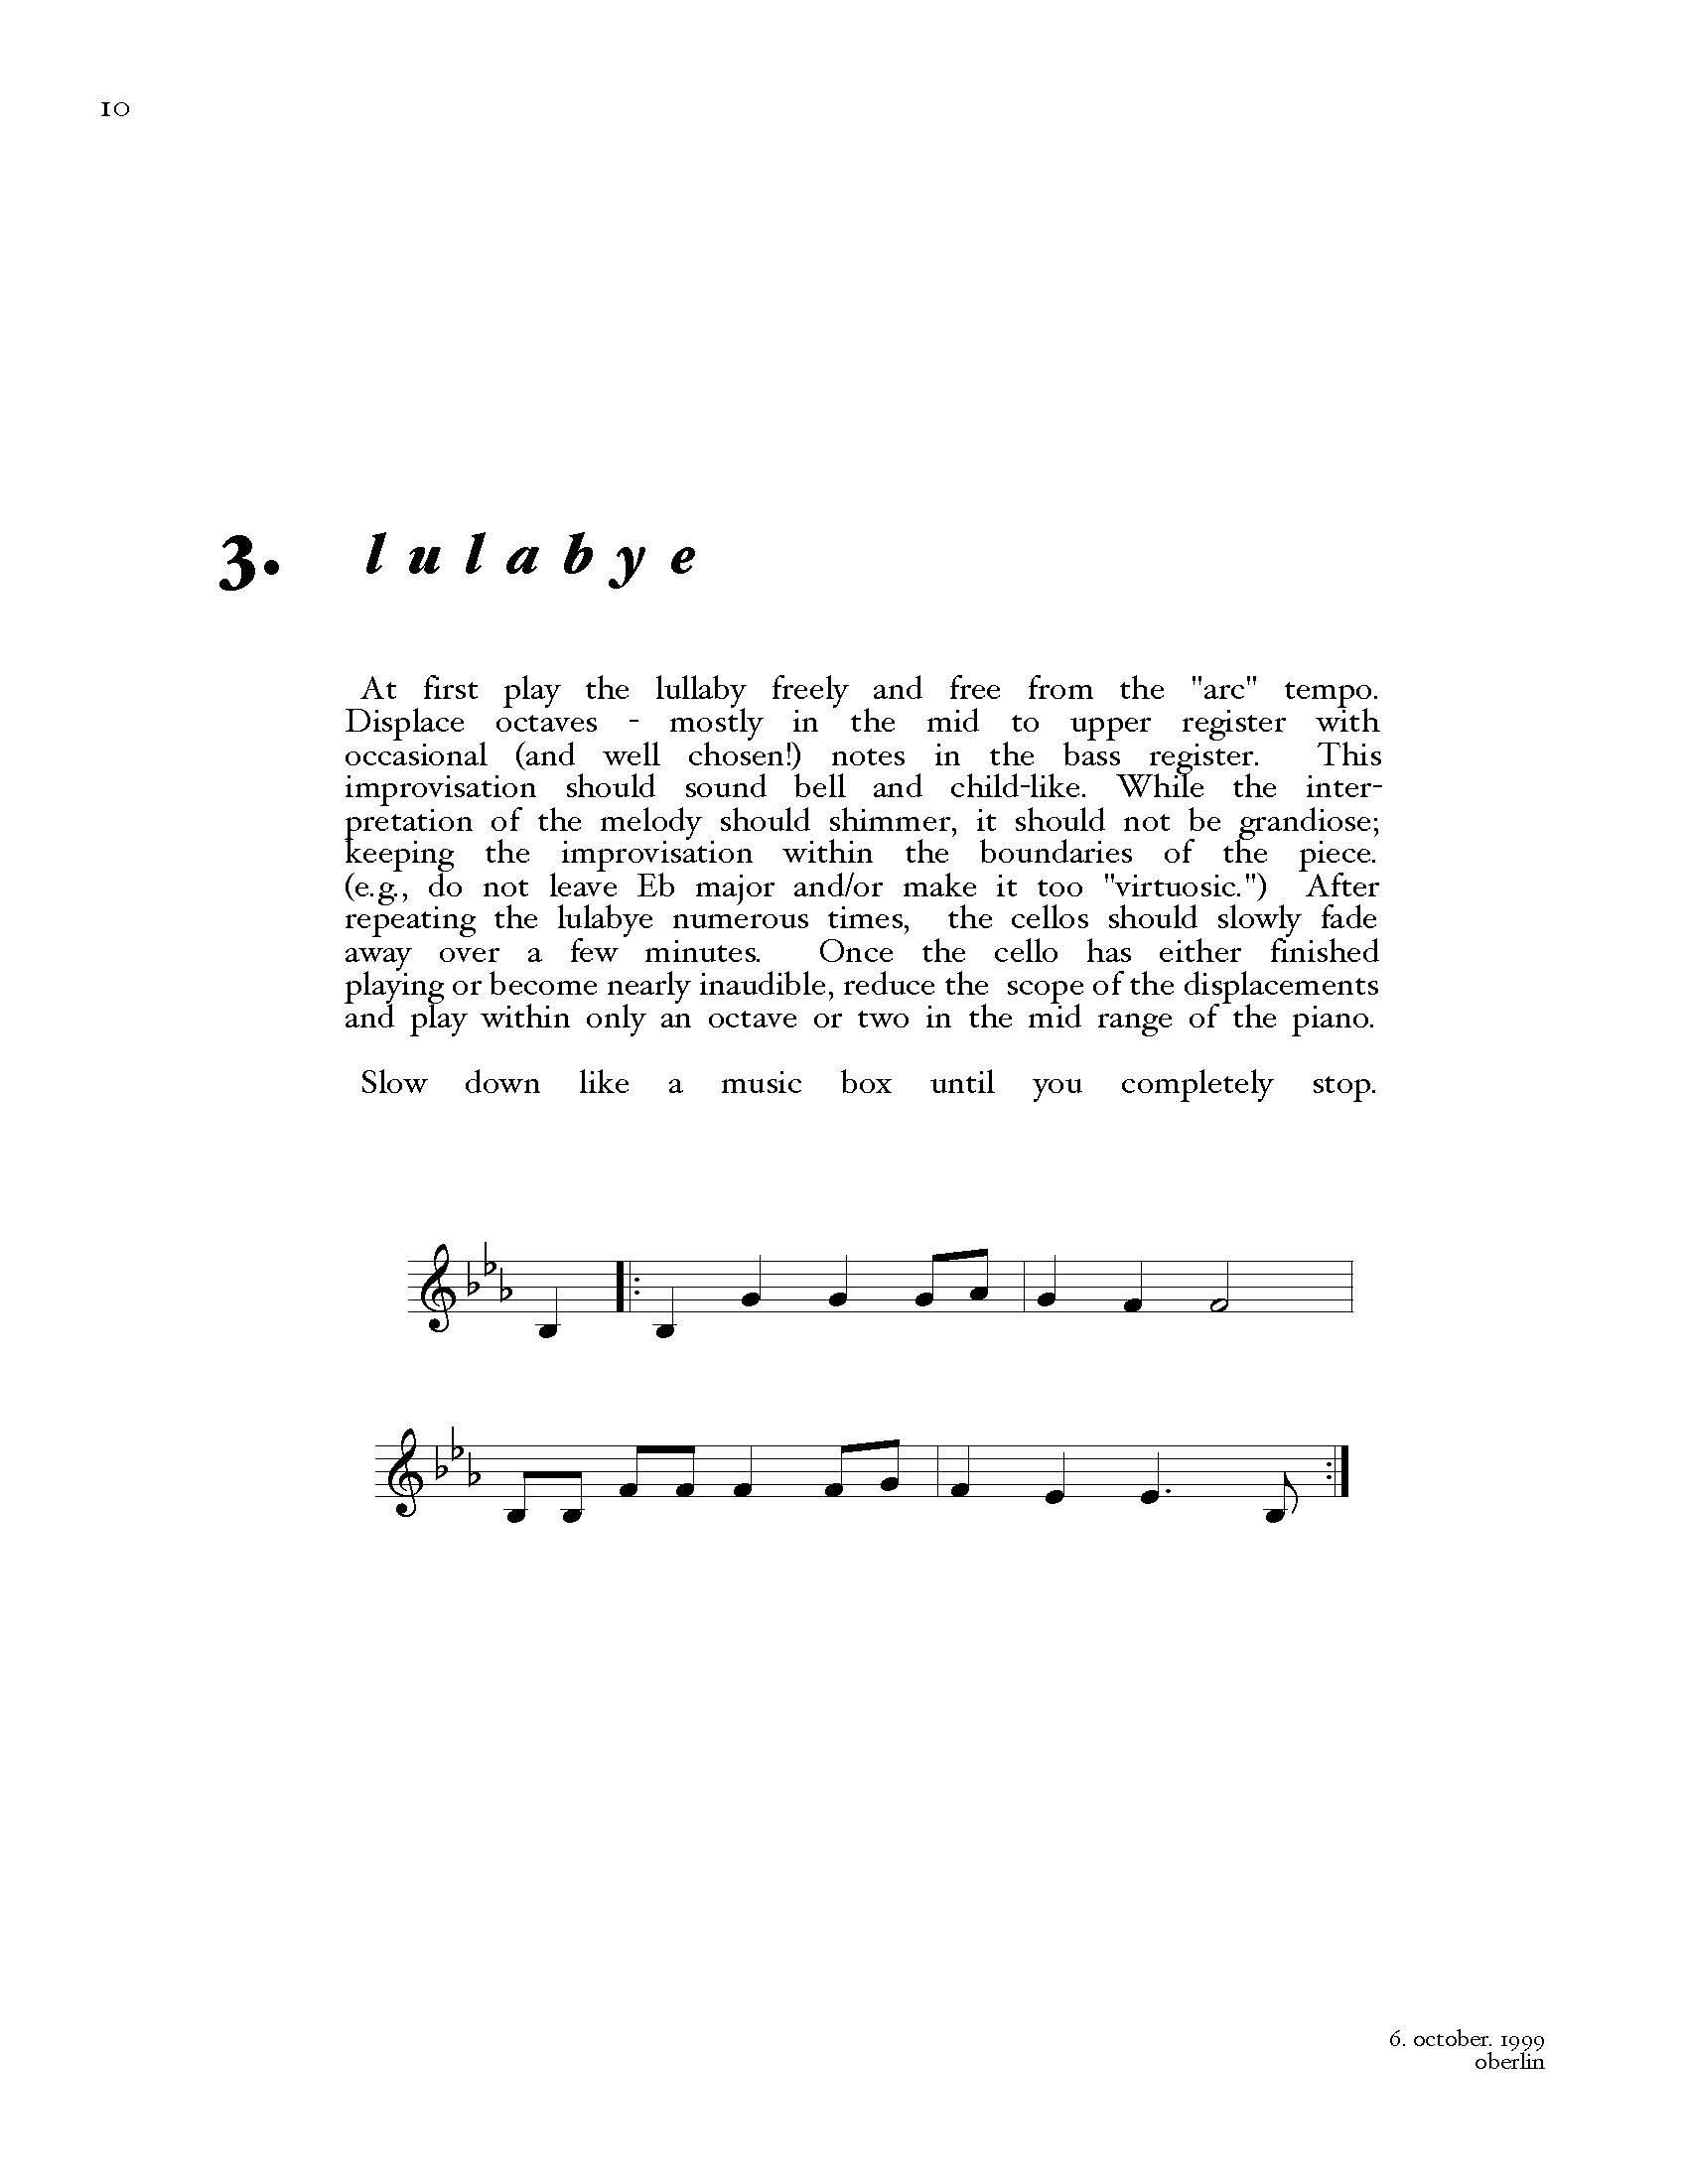 005-X1 Piano Pieces_Page_16.jpg